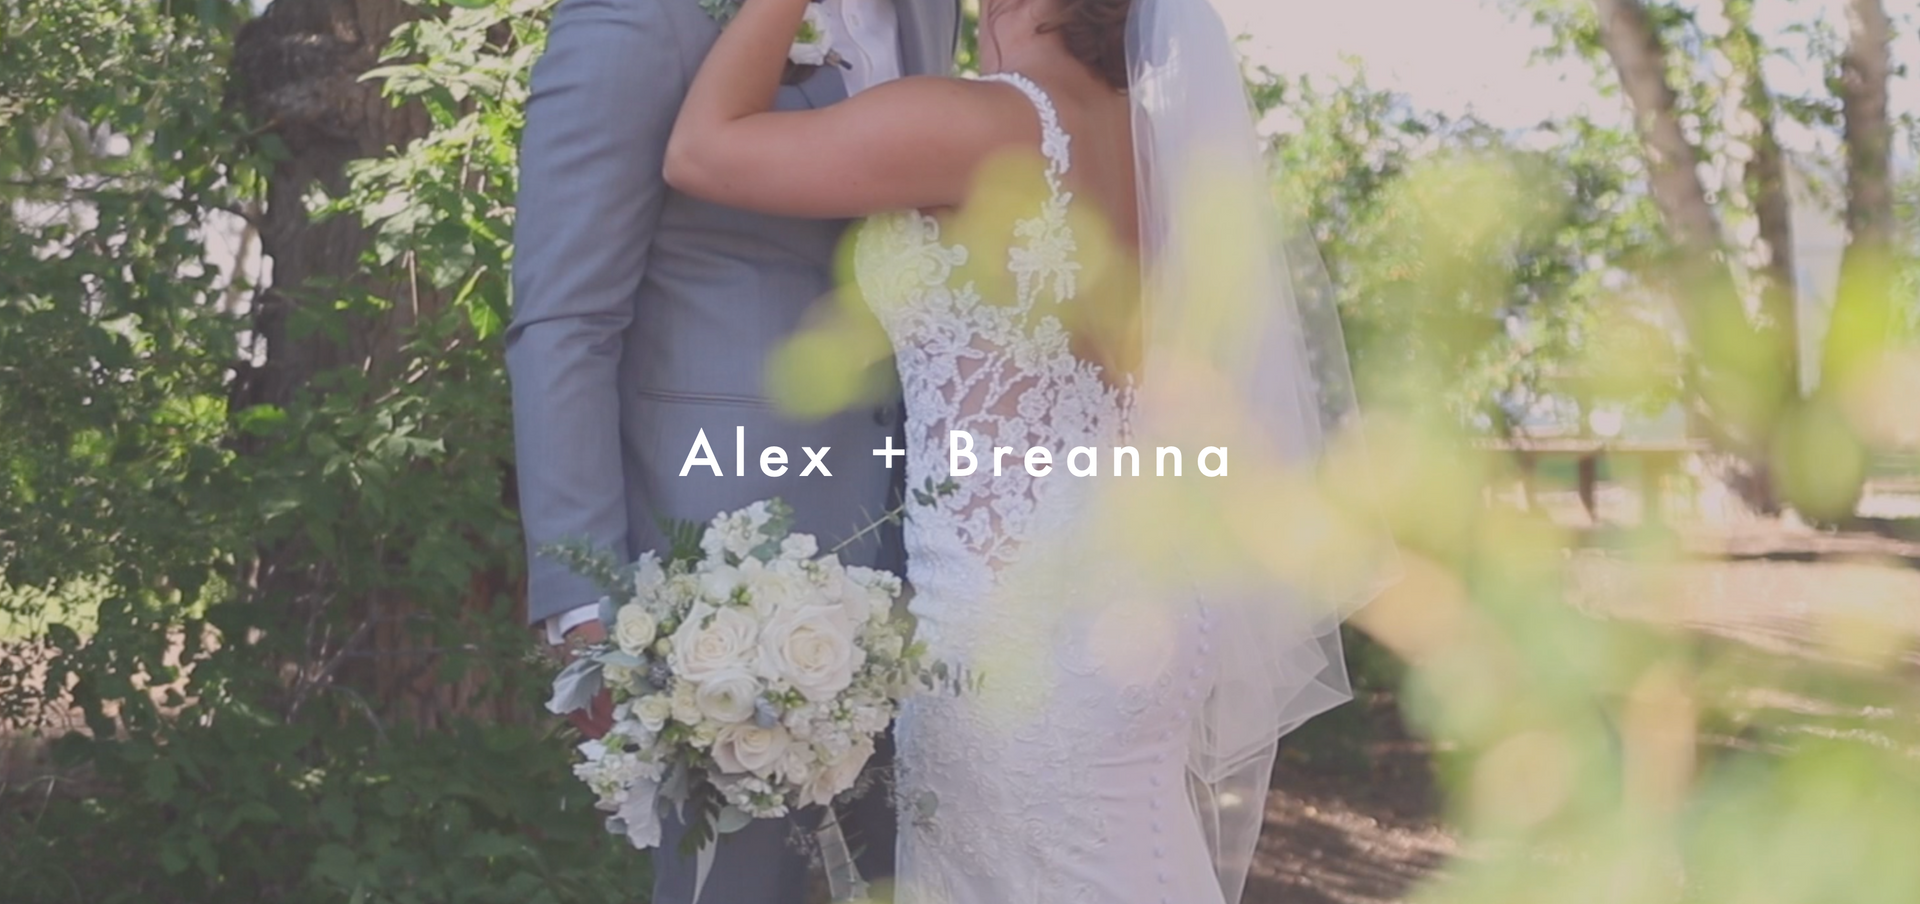 Alex & Breanna